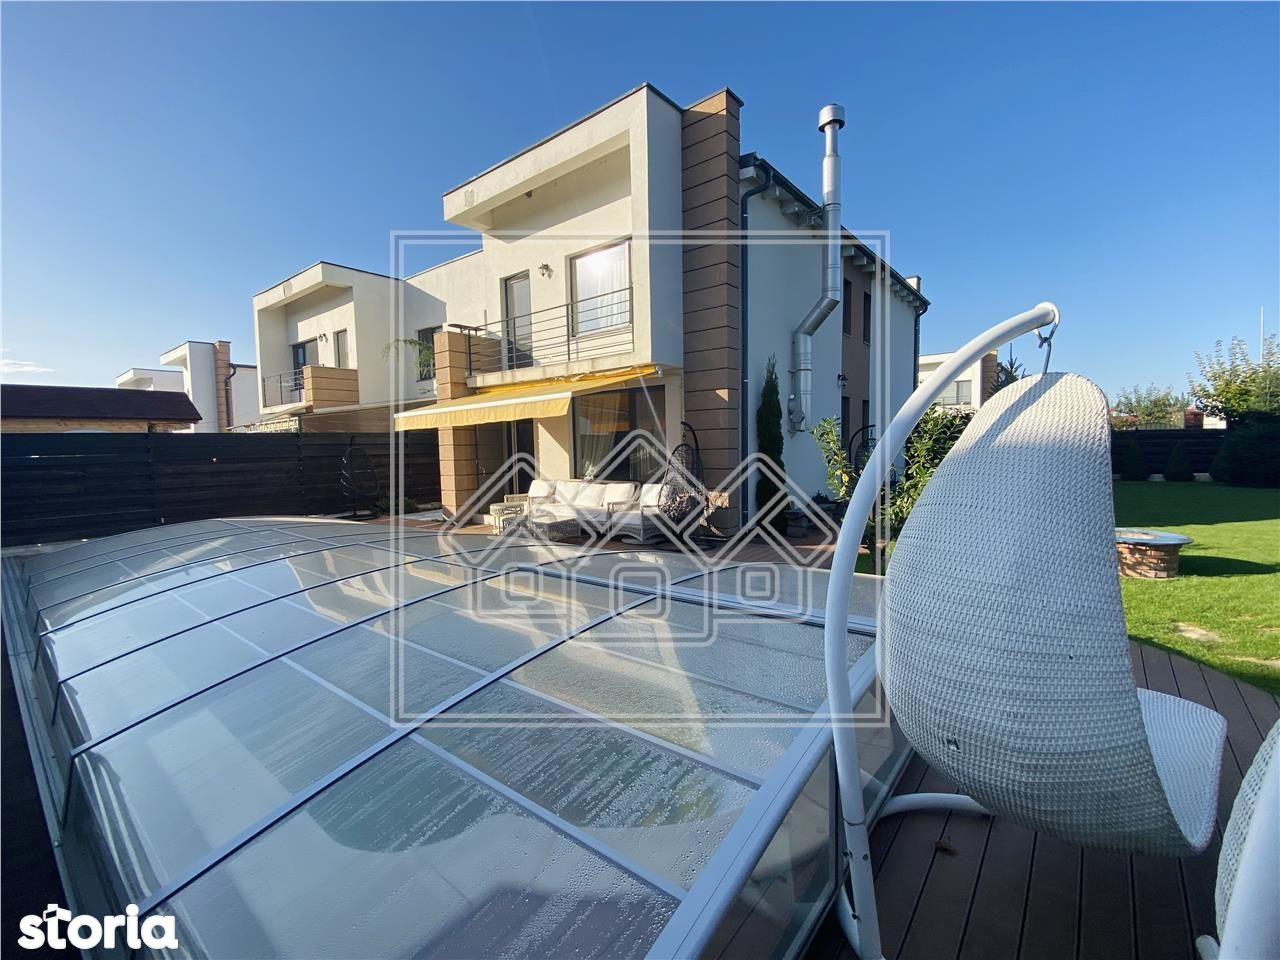 Casa de lux - piscina si sauna in exterior - 509 mp teren - Turnisor